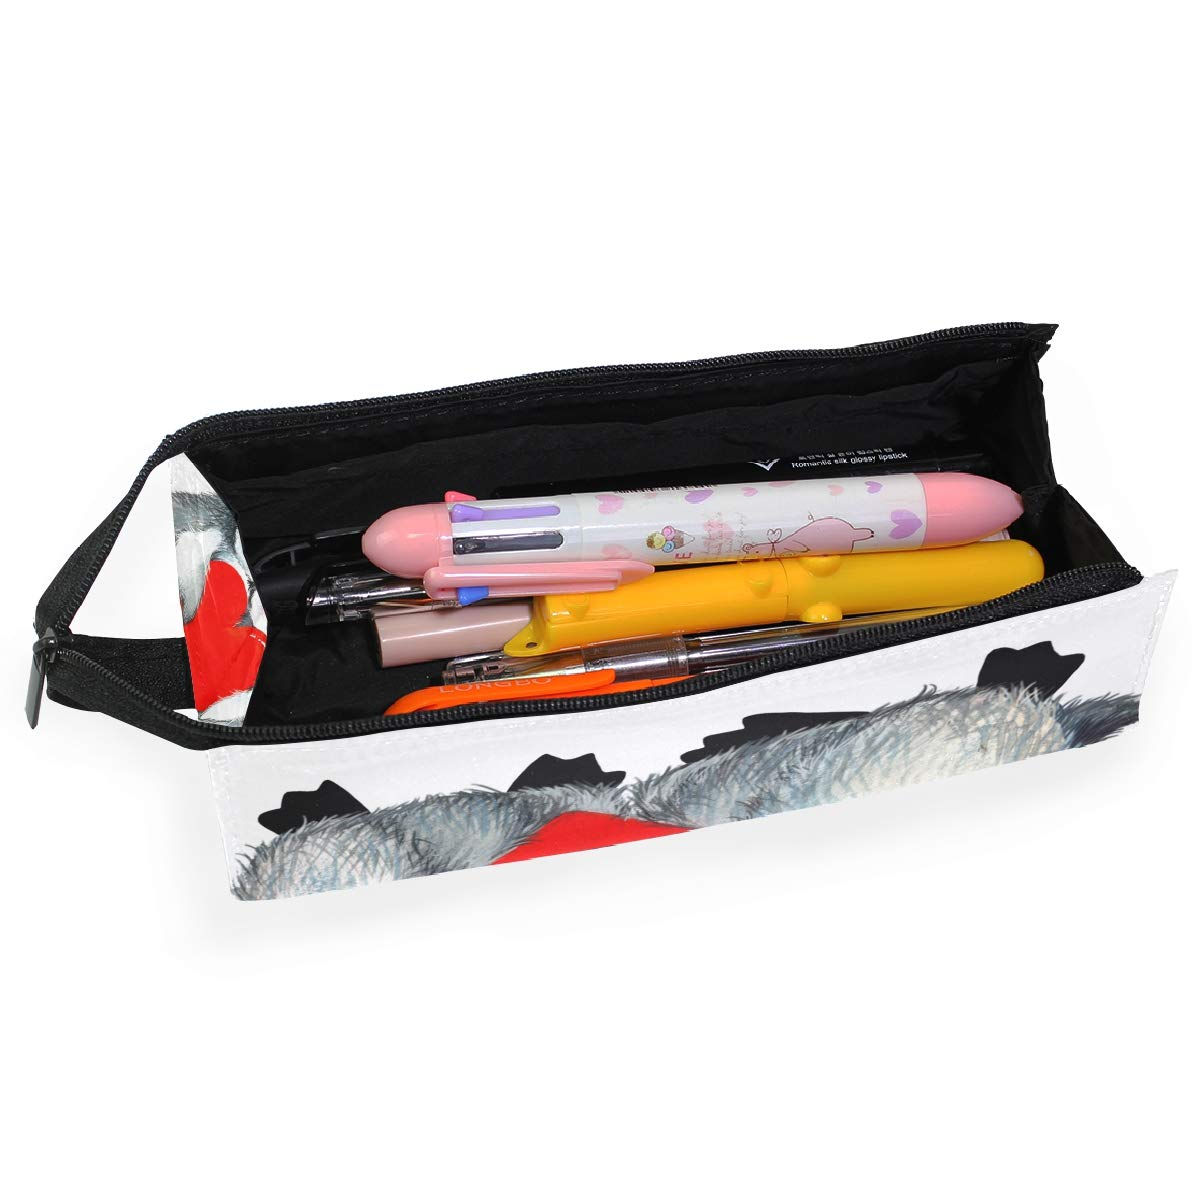 My Little Nest Eyeglass Sunglasses Holder Pouch Bag Cute Penguin Red Heart Multi Function Zipper Pen Case Pencil Bag Organizer